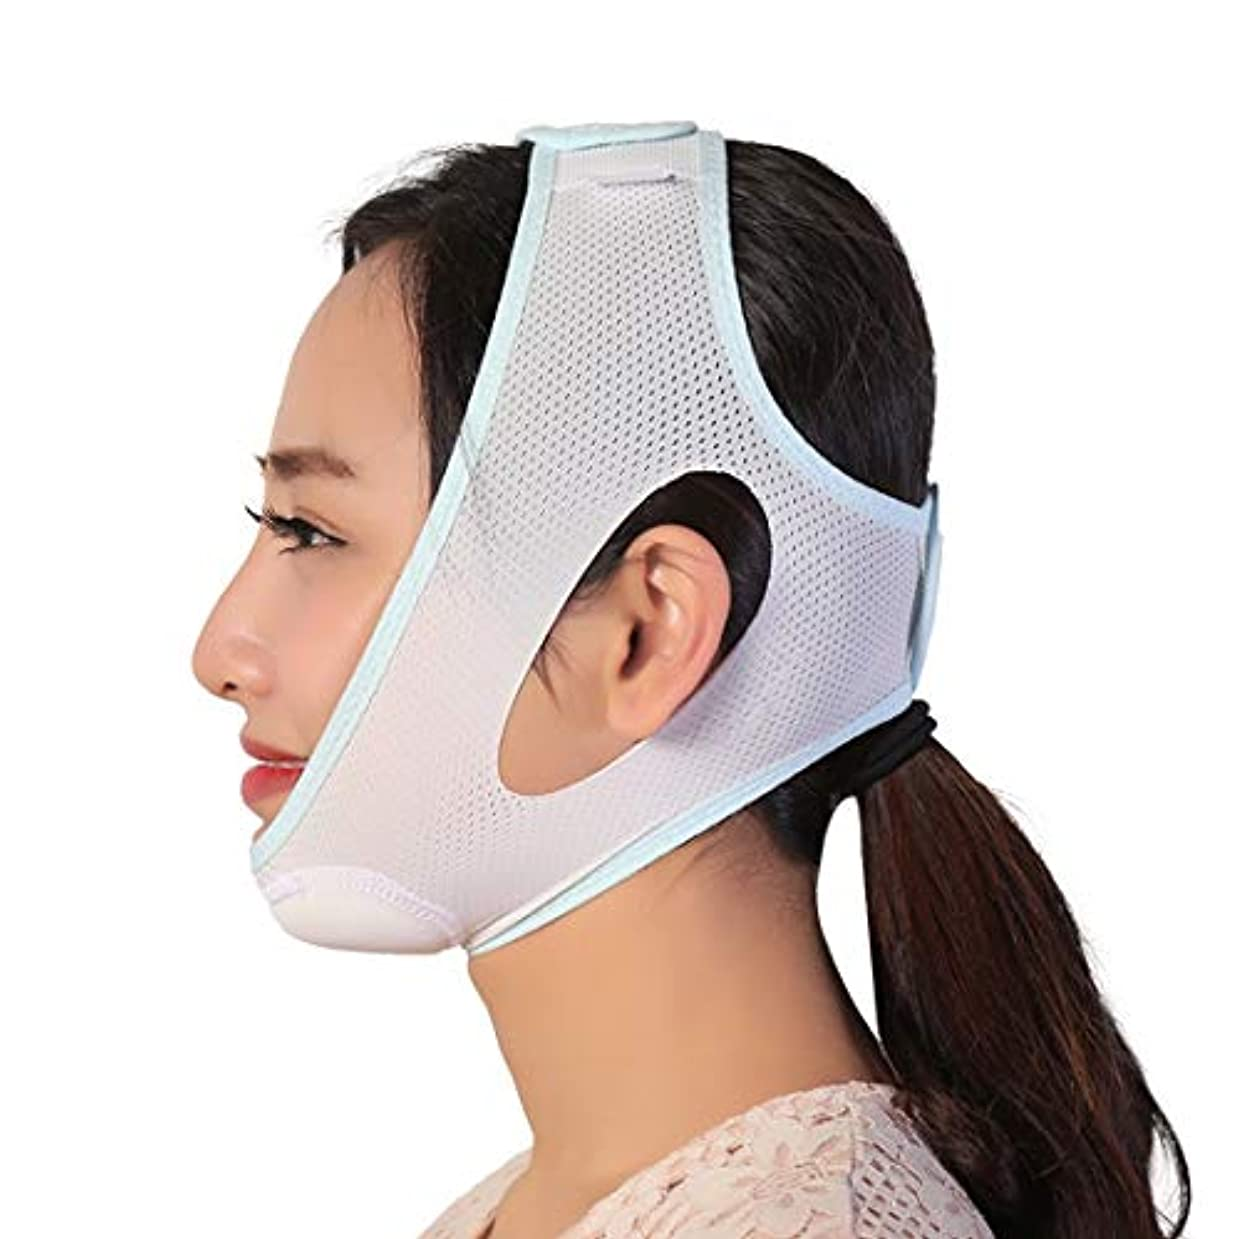 ZWBD フェイスマスク, 顔を持ち上げる包帯マスク包帯小v顔整形マスクフェイスリフトステッカーに法線二重あご線術後矯正ベルト (Size : L)